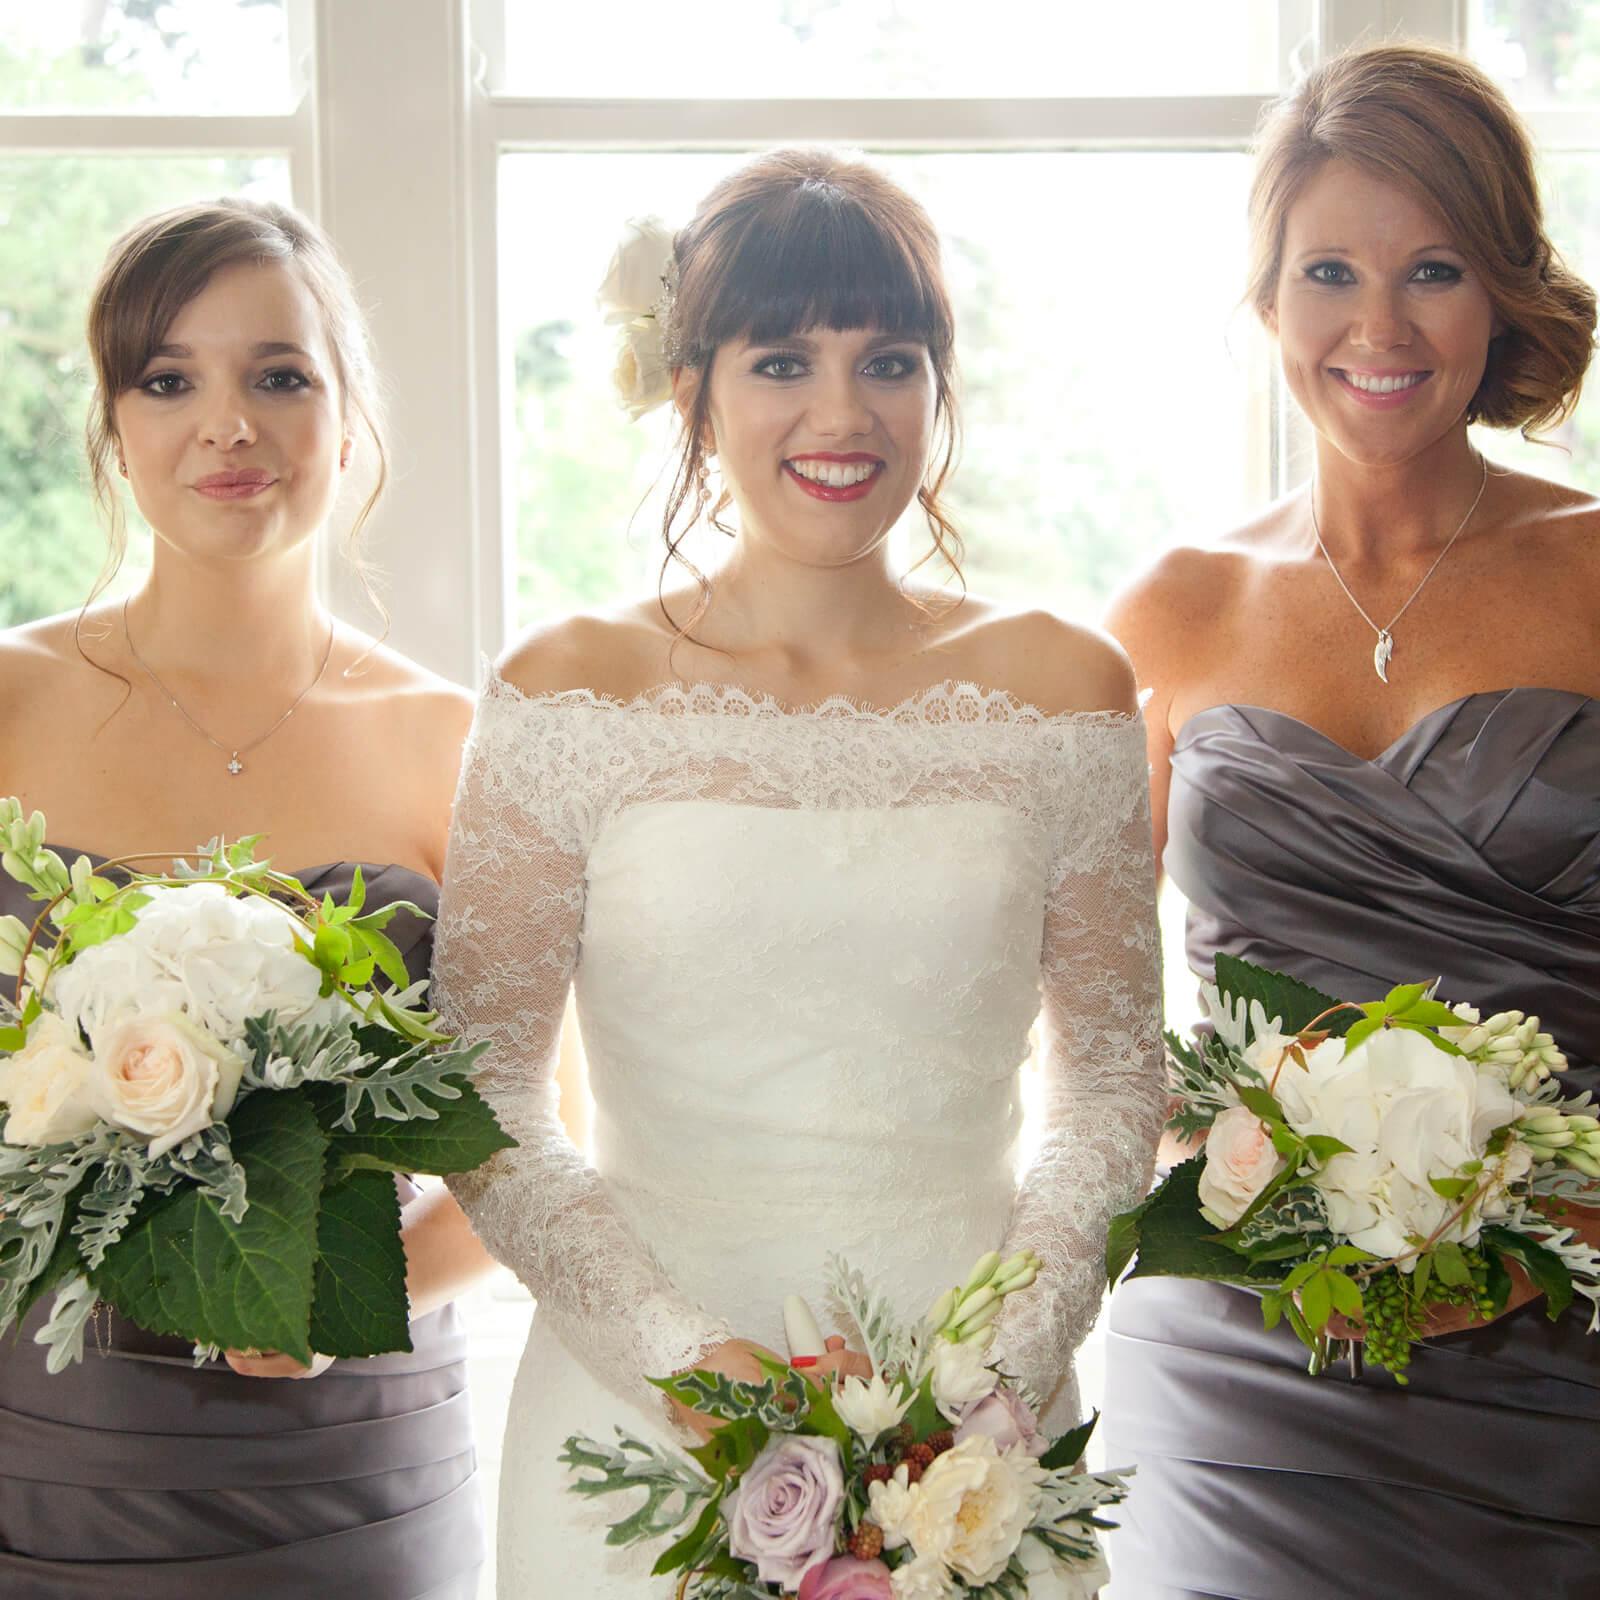 Bridesmaids-Ettington-bride